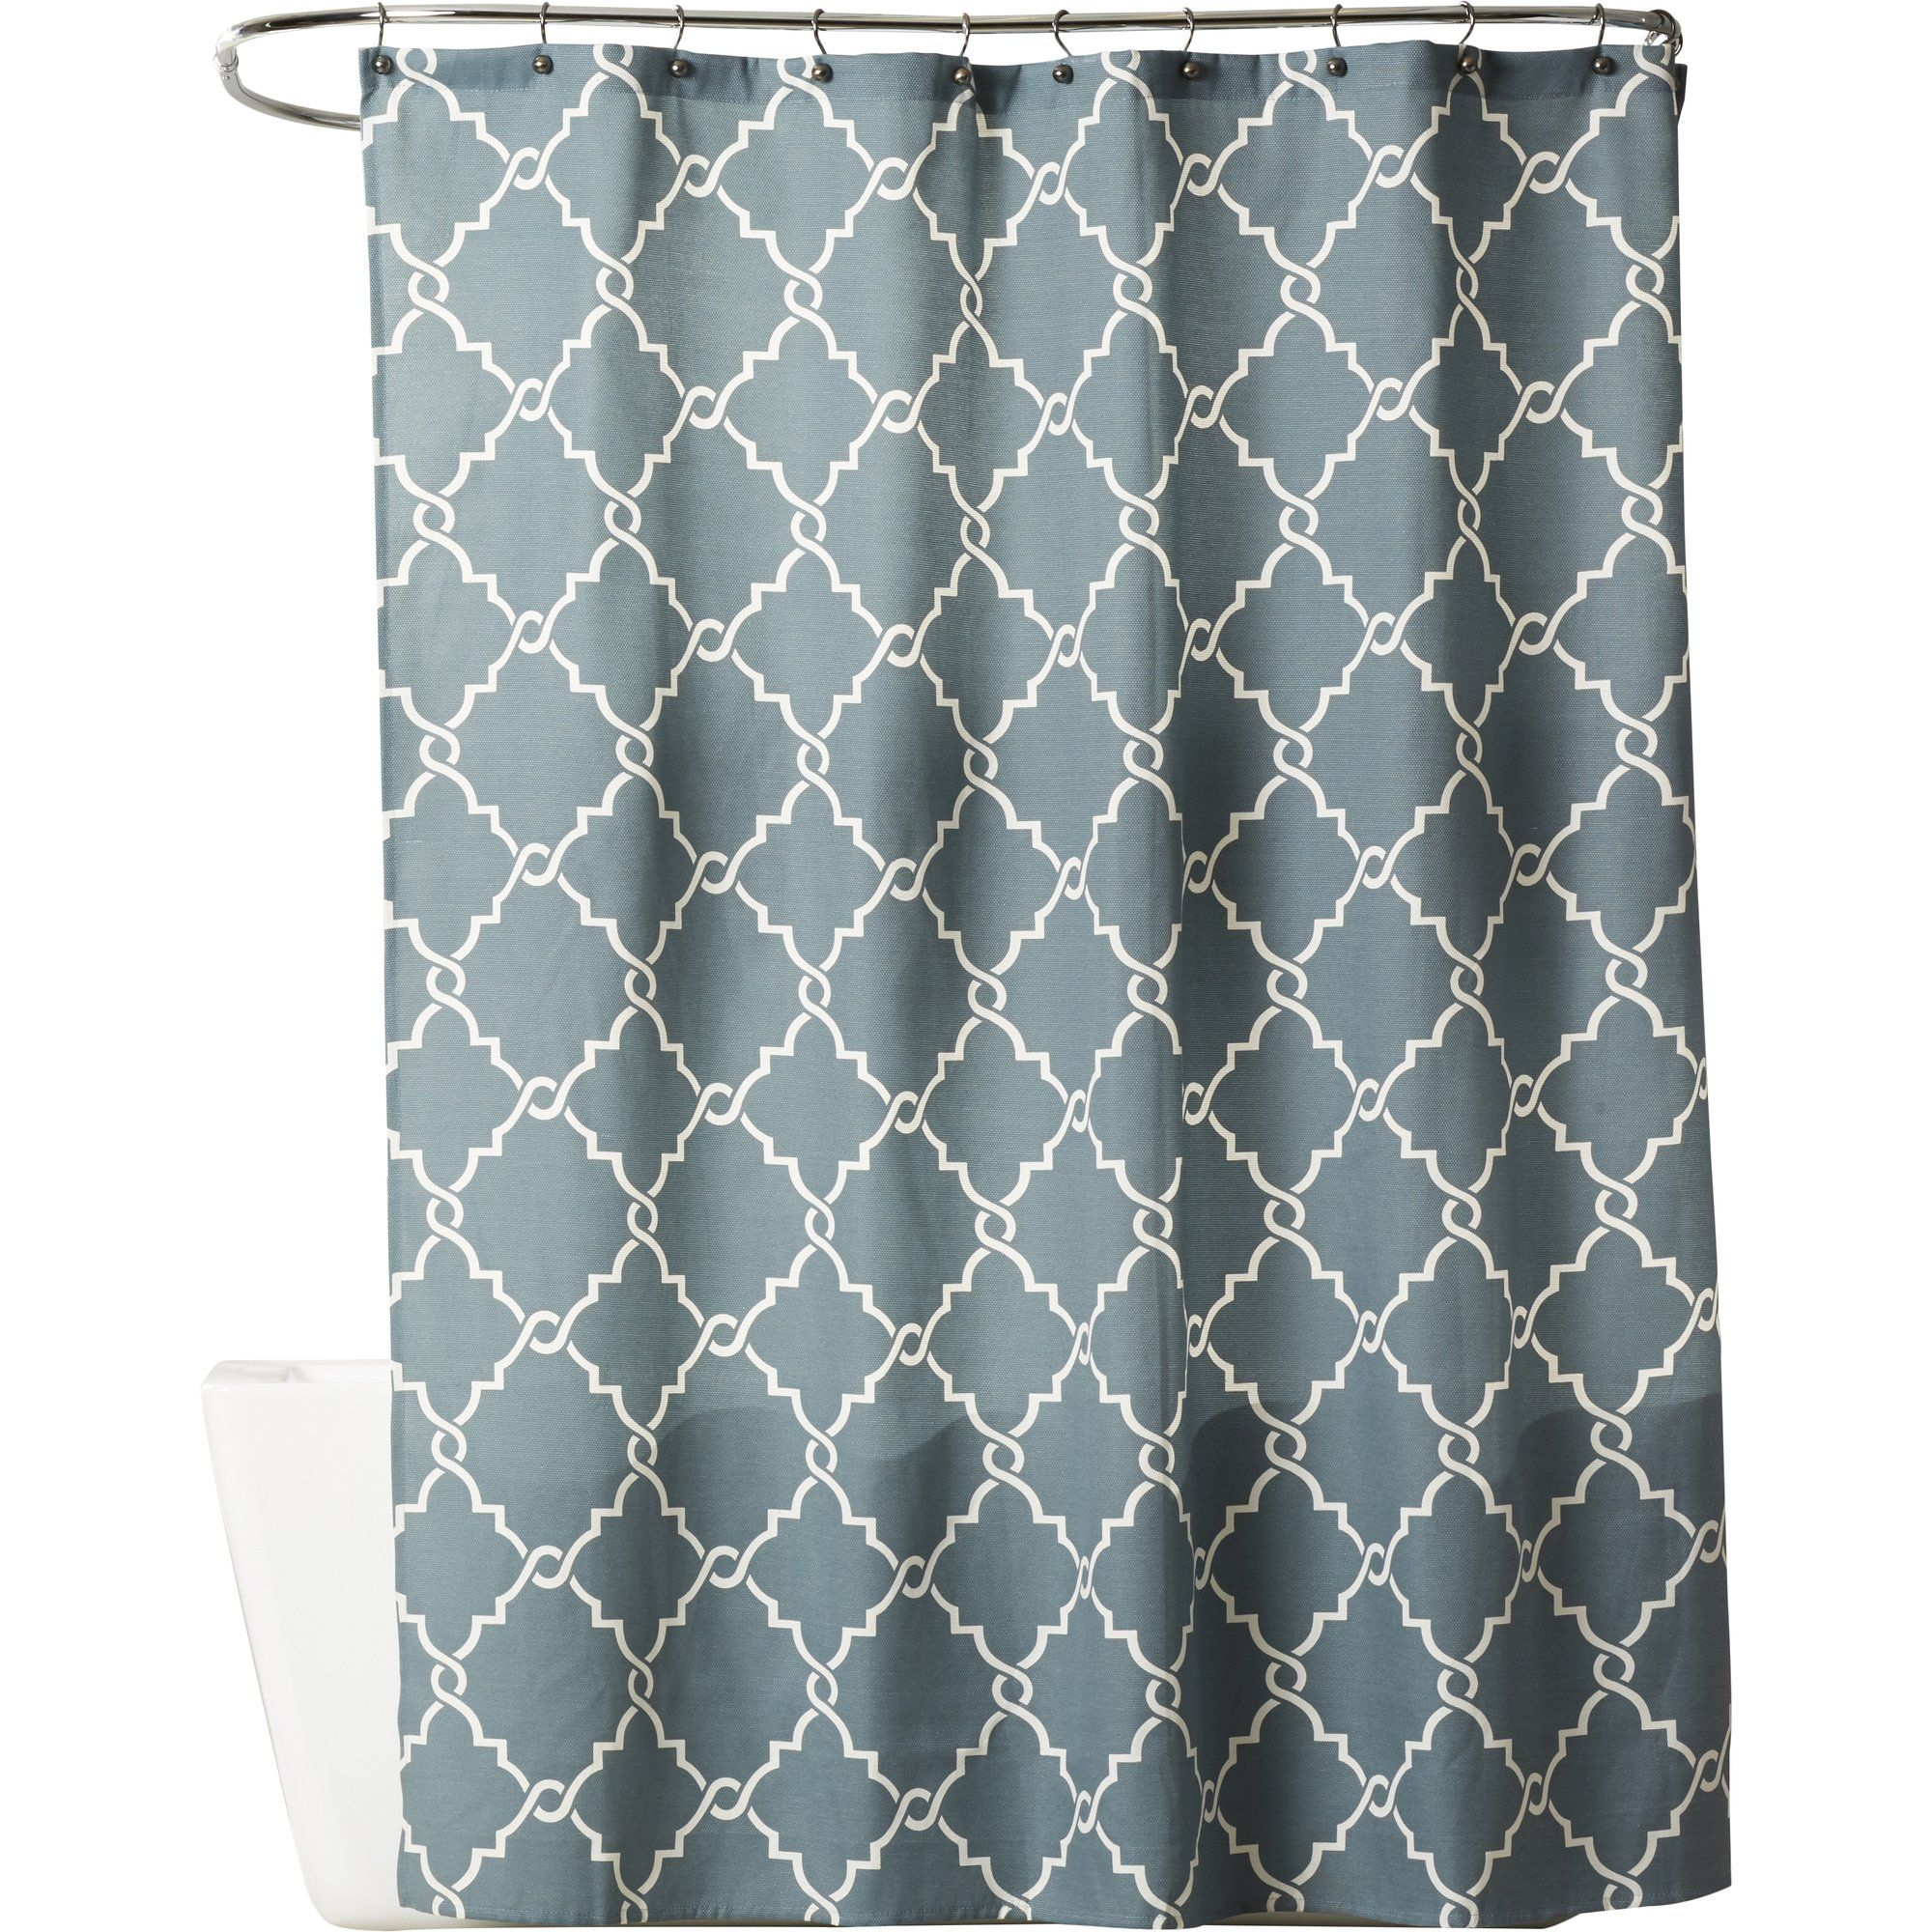 Elegant Design for Creating More Manly Masculine Shower Curtains ...